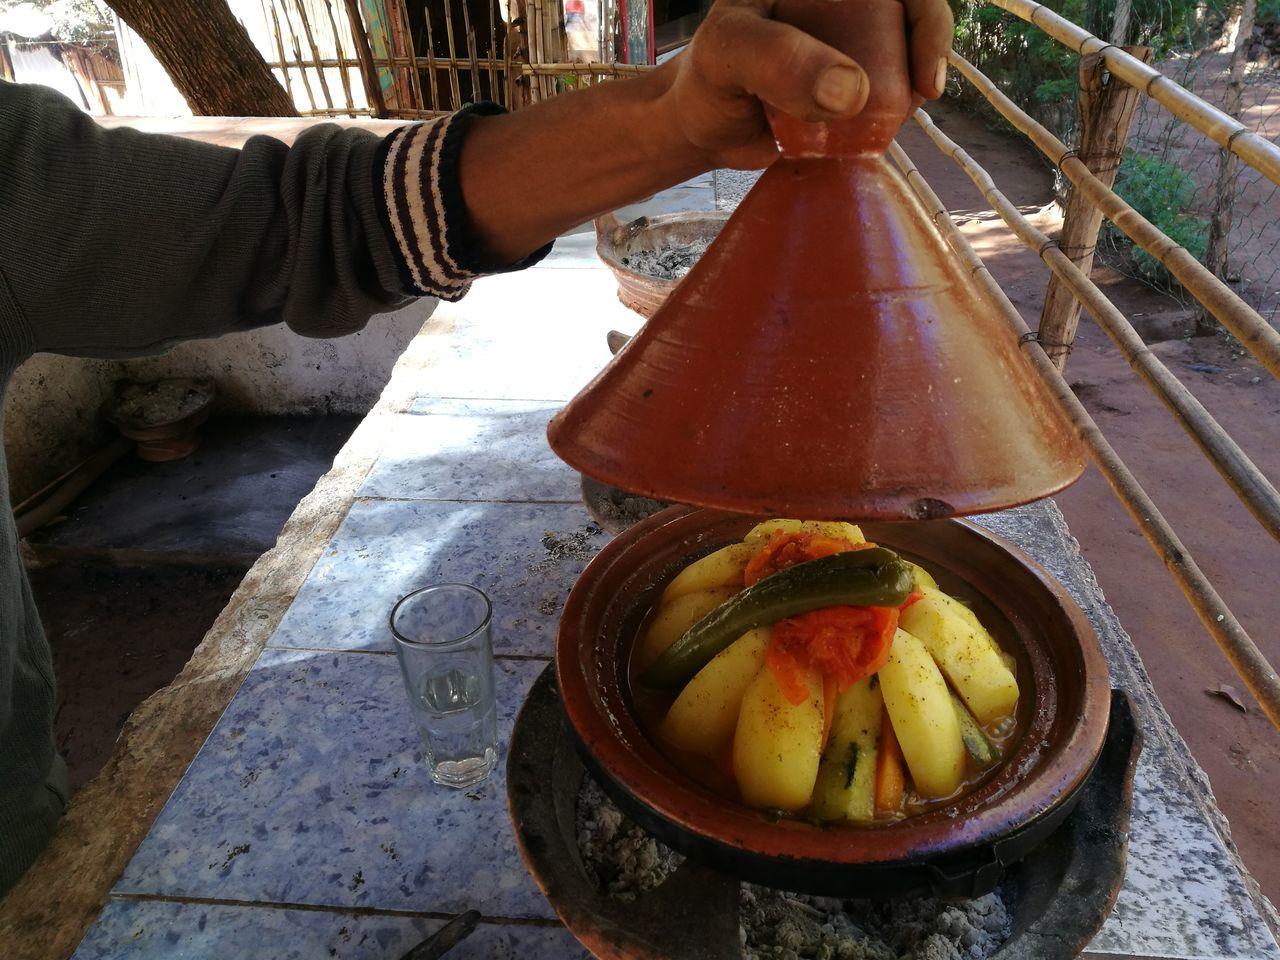 Berber  Coal Cookware Earthenware Food Meat Pot Rustic Stew Tajine Tajine Moroccan Food Typical Vegetables